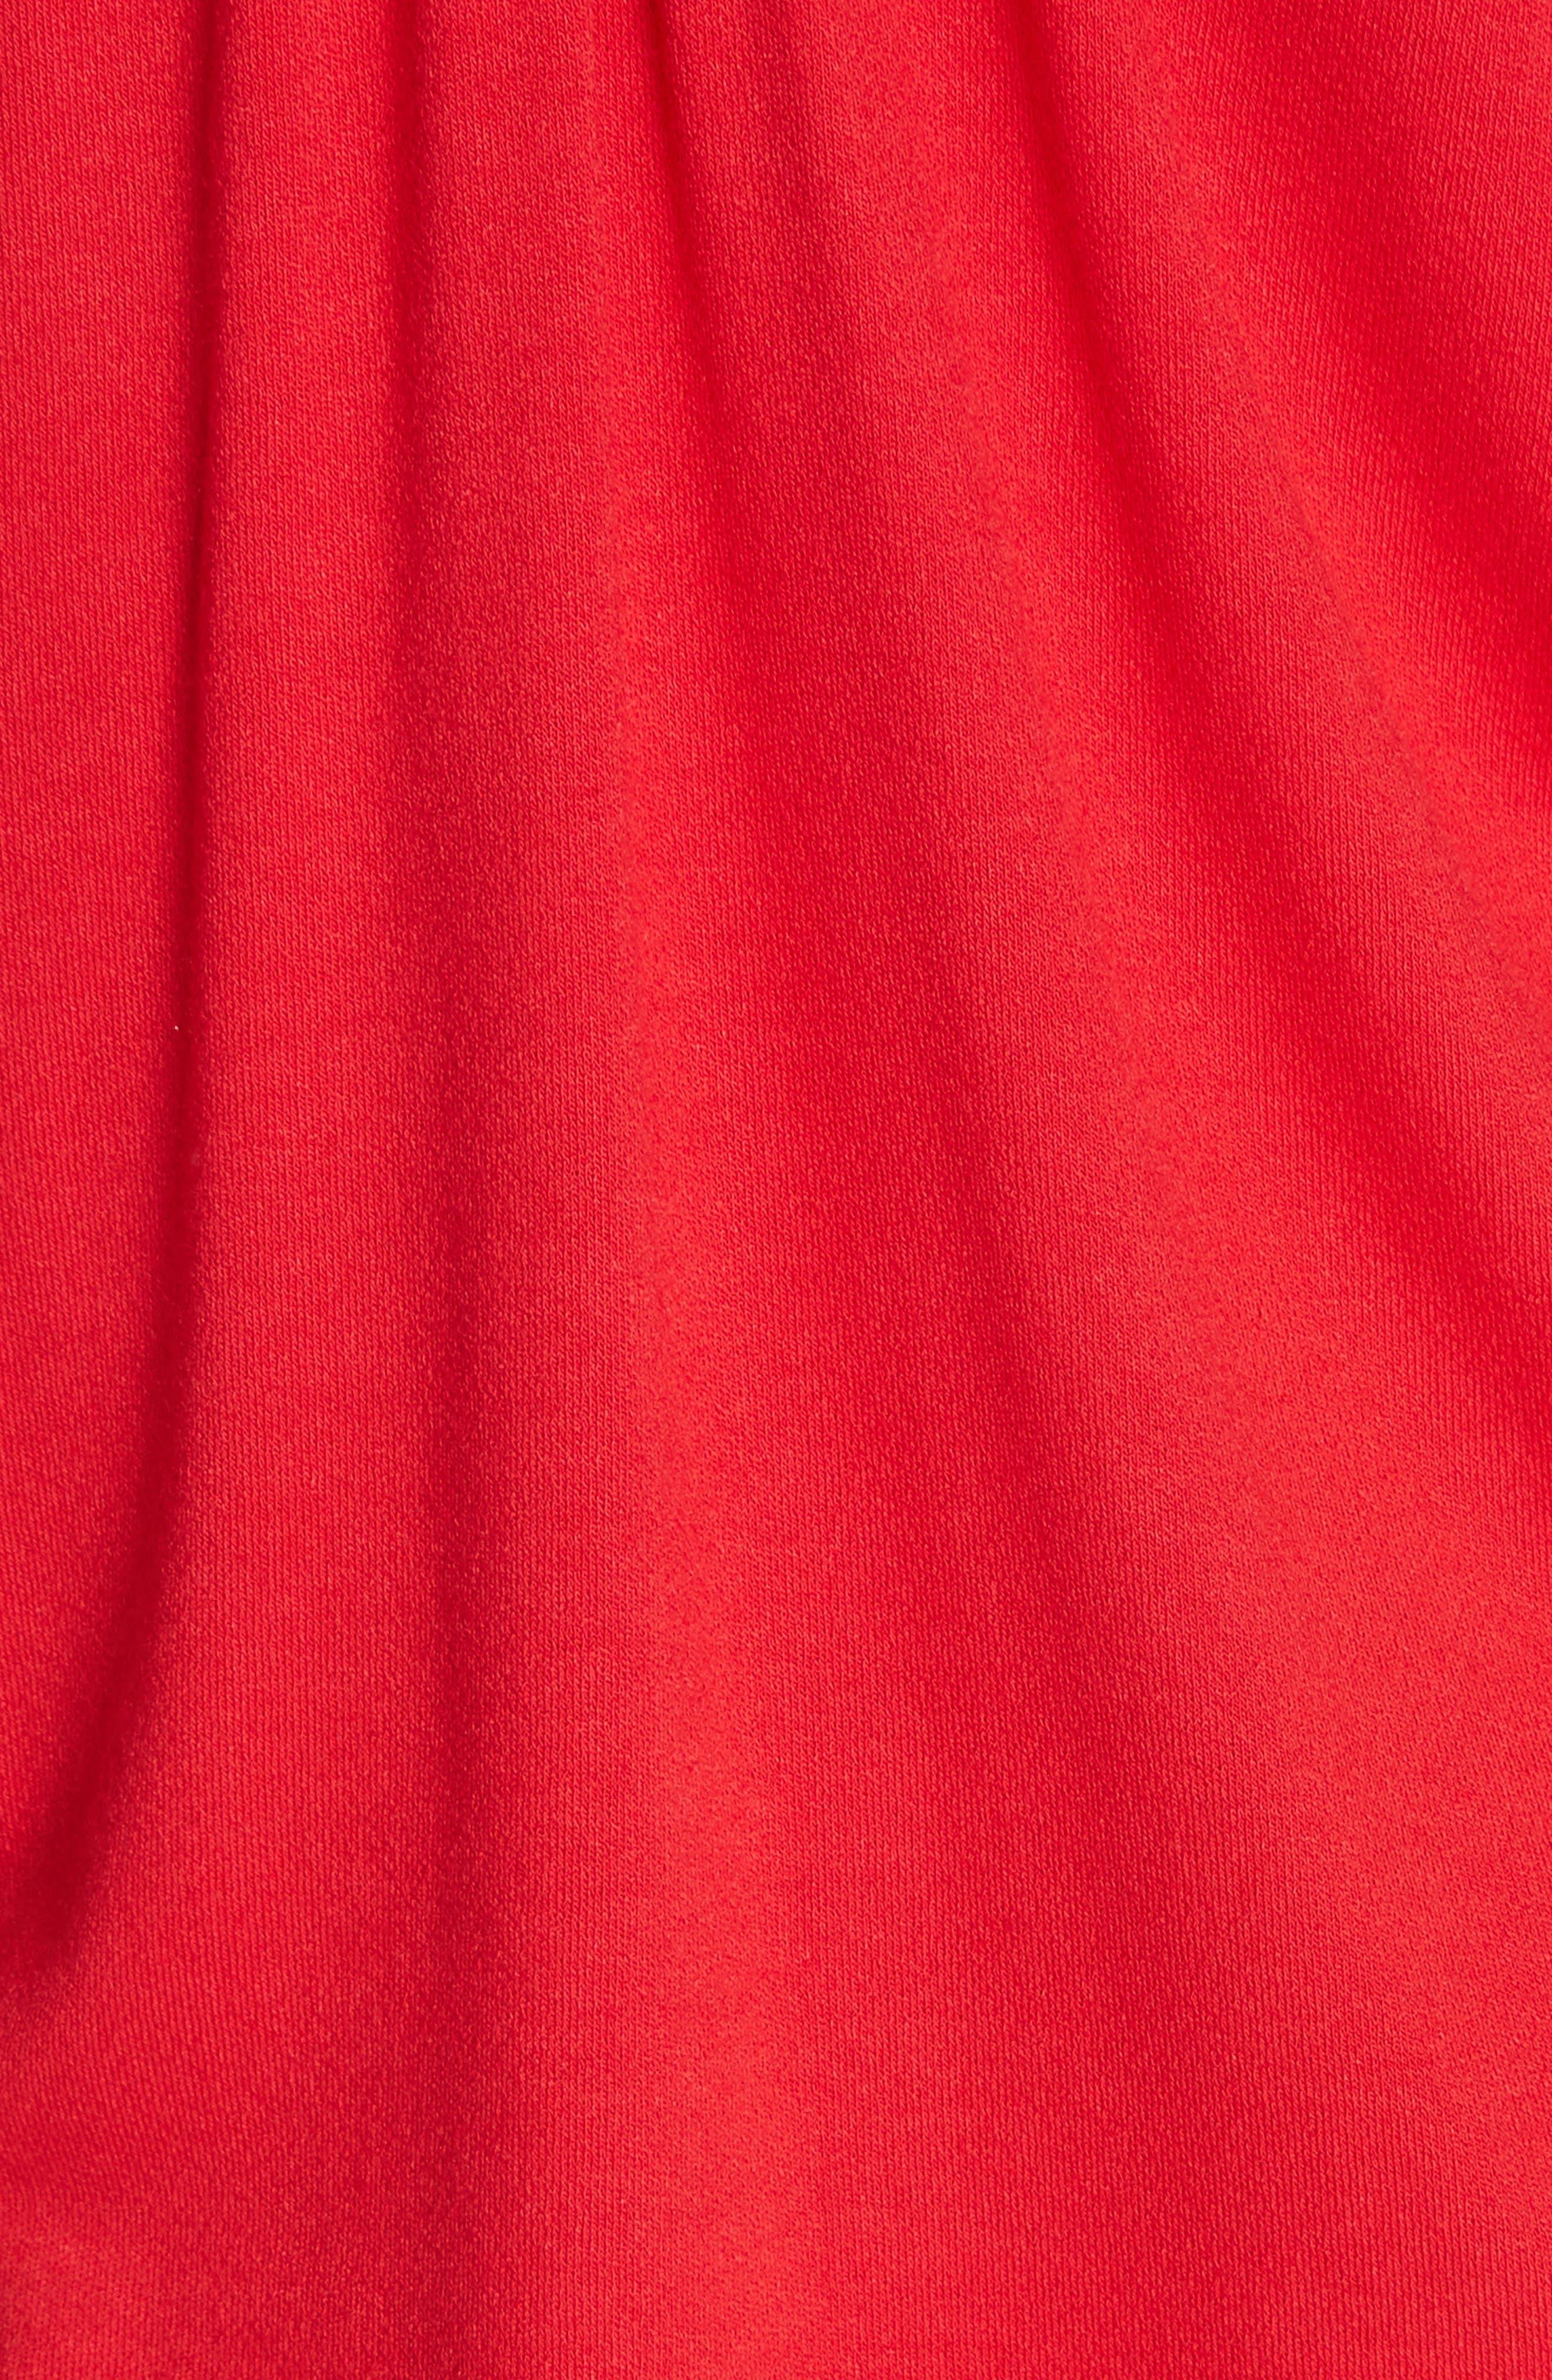 Believe Me Cold Shoulder Top,                             Alternate thumbnail 5, color,                             Red